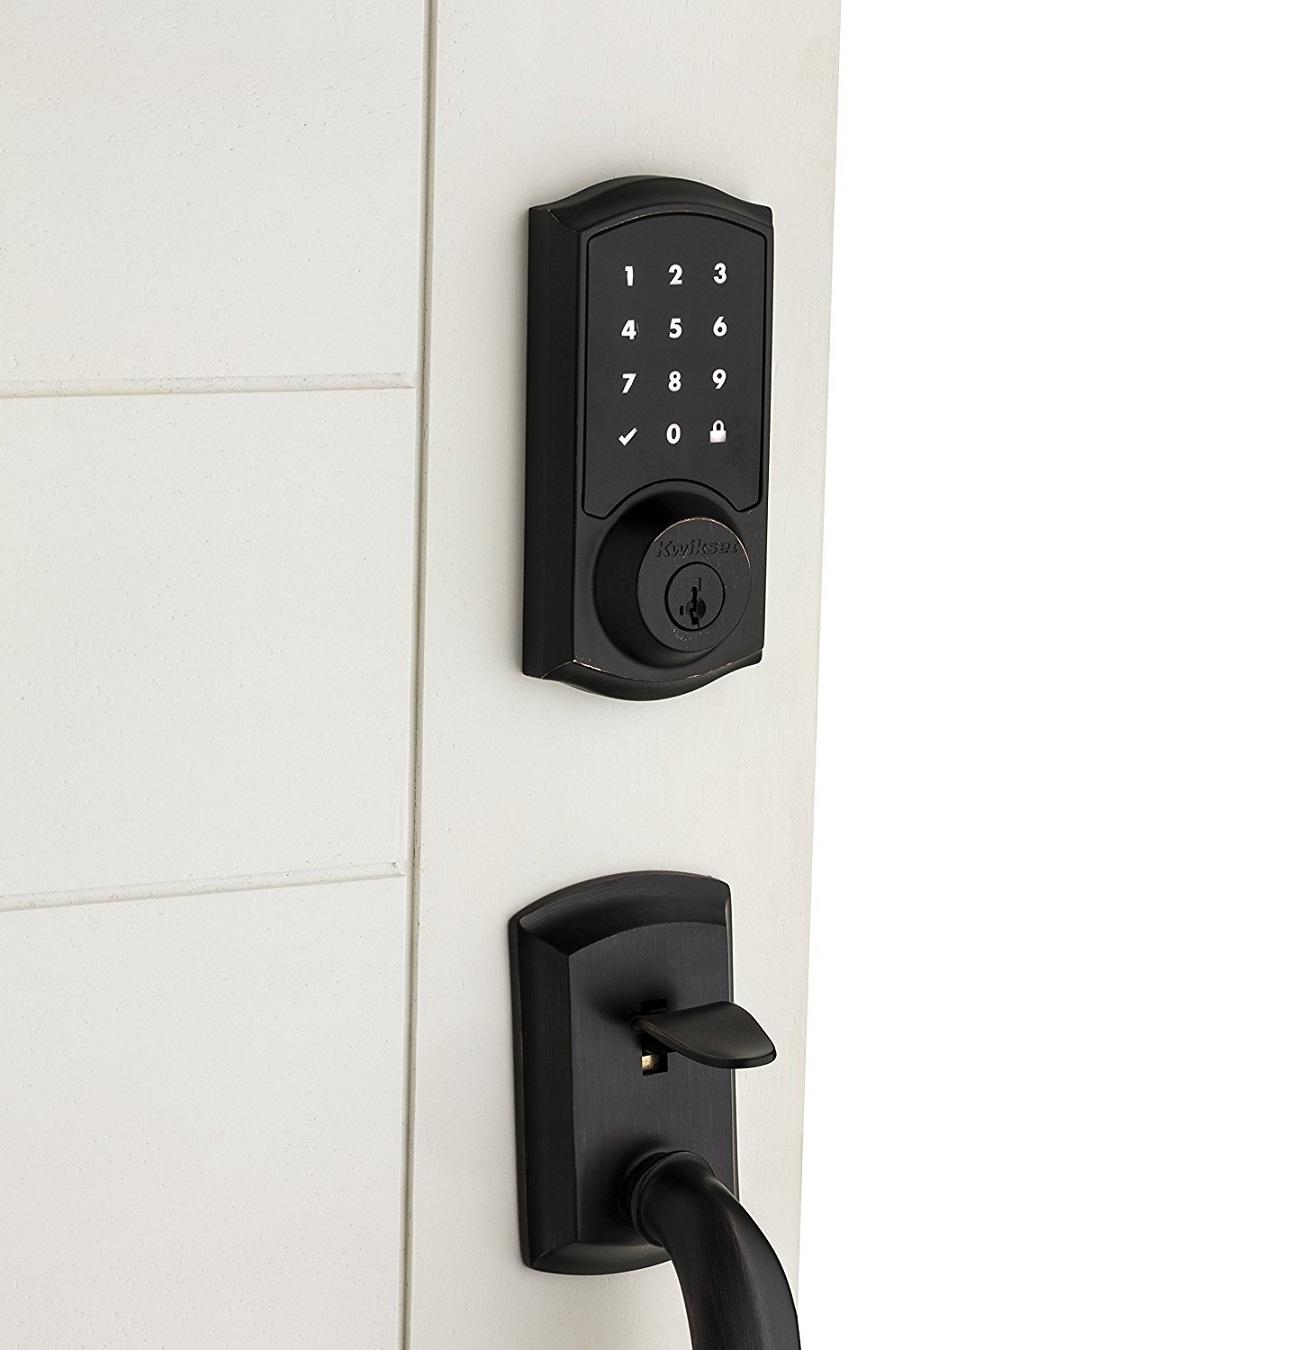 door knob alarm system photo - 7